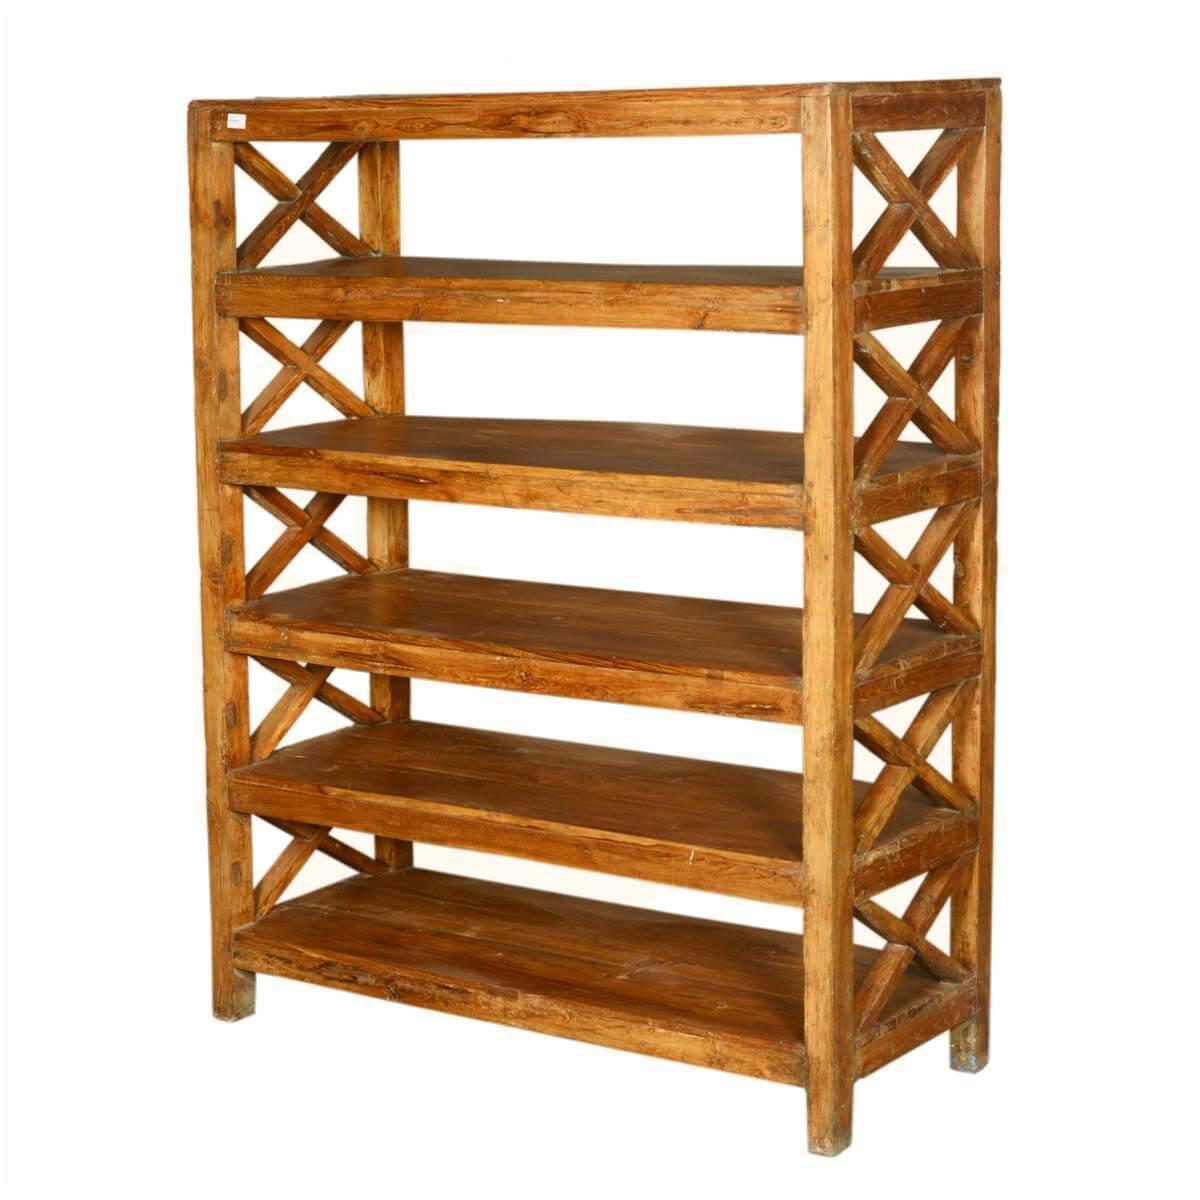 Dallas Ranch Rustic Reclaimed Wood 5 Open Shelf Bookcase